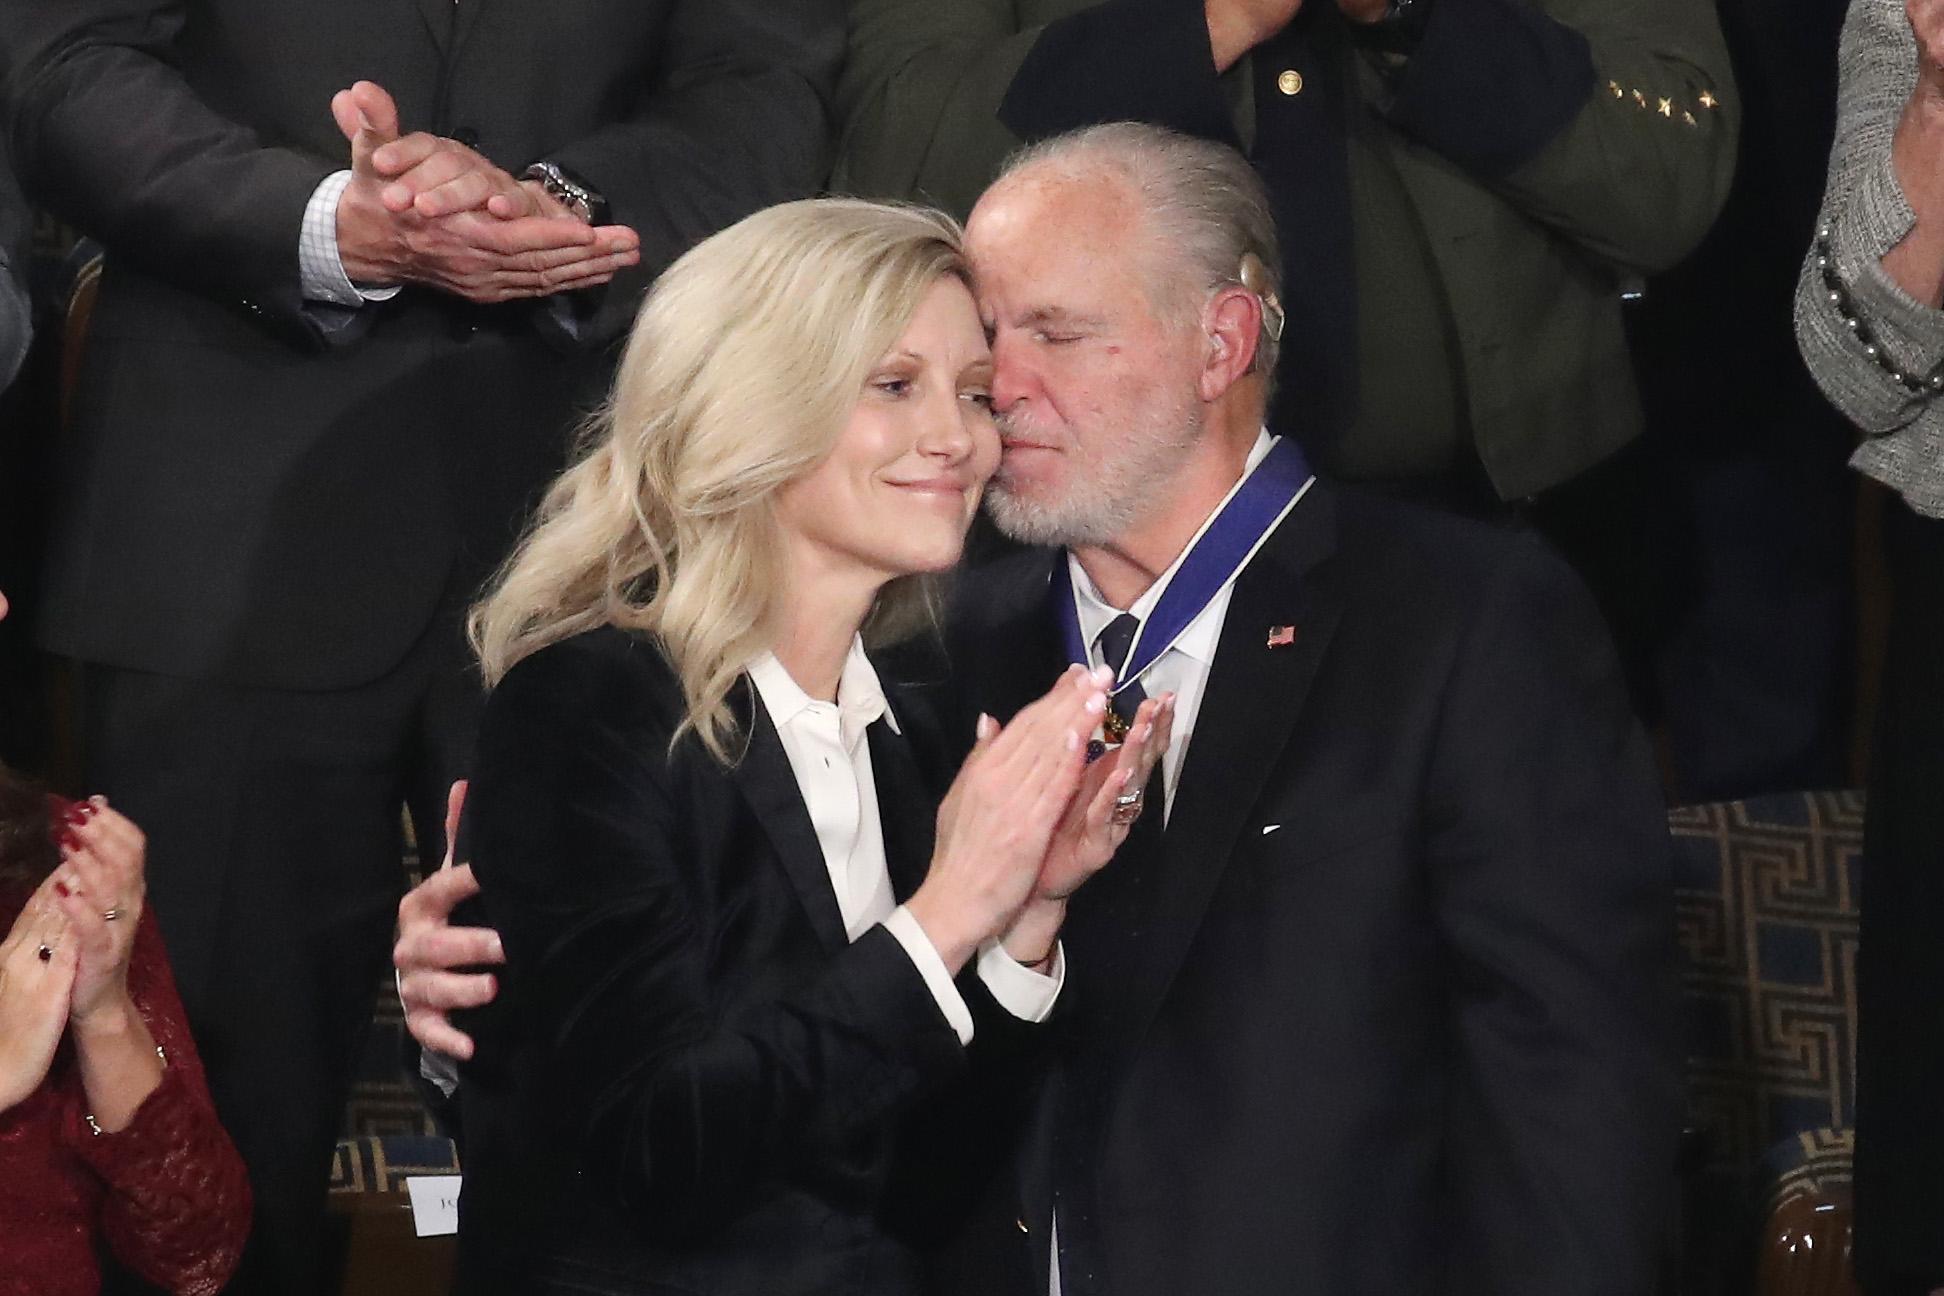 Rush Limbaugh embraces his wife, Kathryn Adams Limbaugh